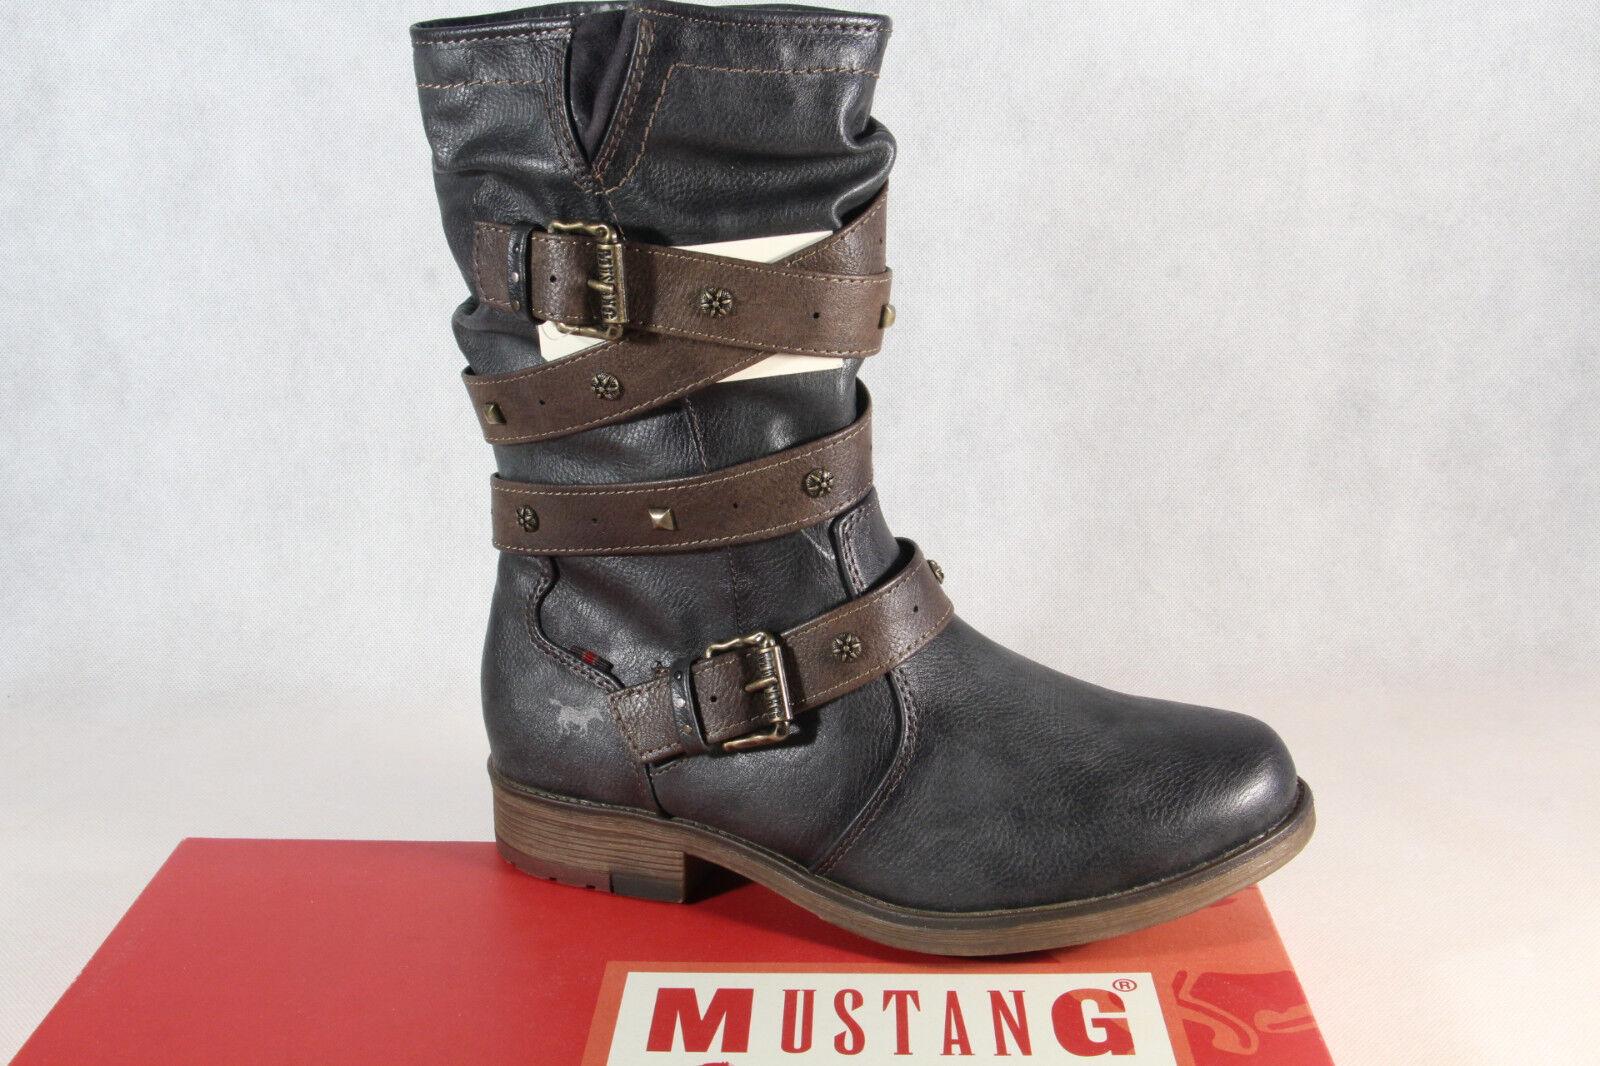 Mustang Damen Stiefelette Stiefel Winterstiefel grau 1295-603-259 NEU